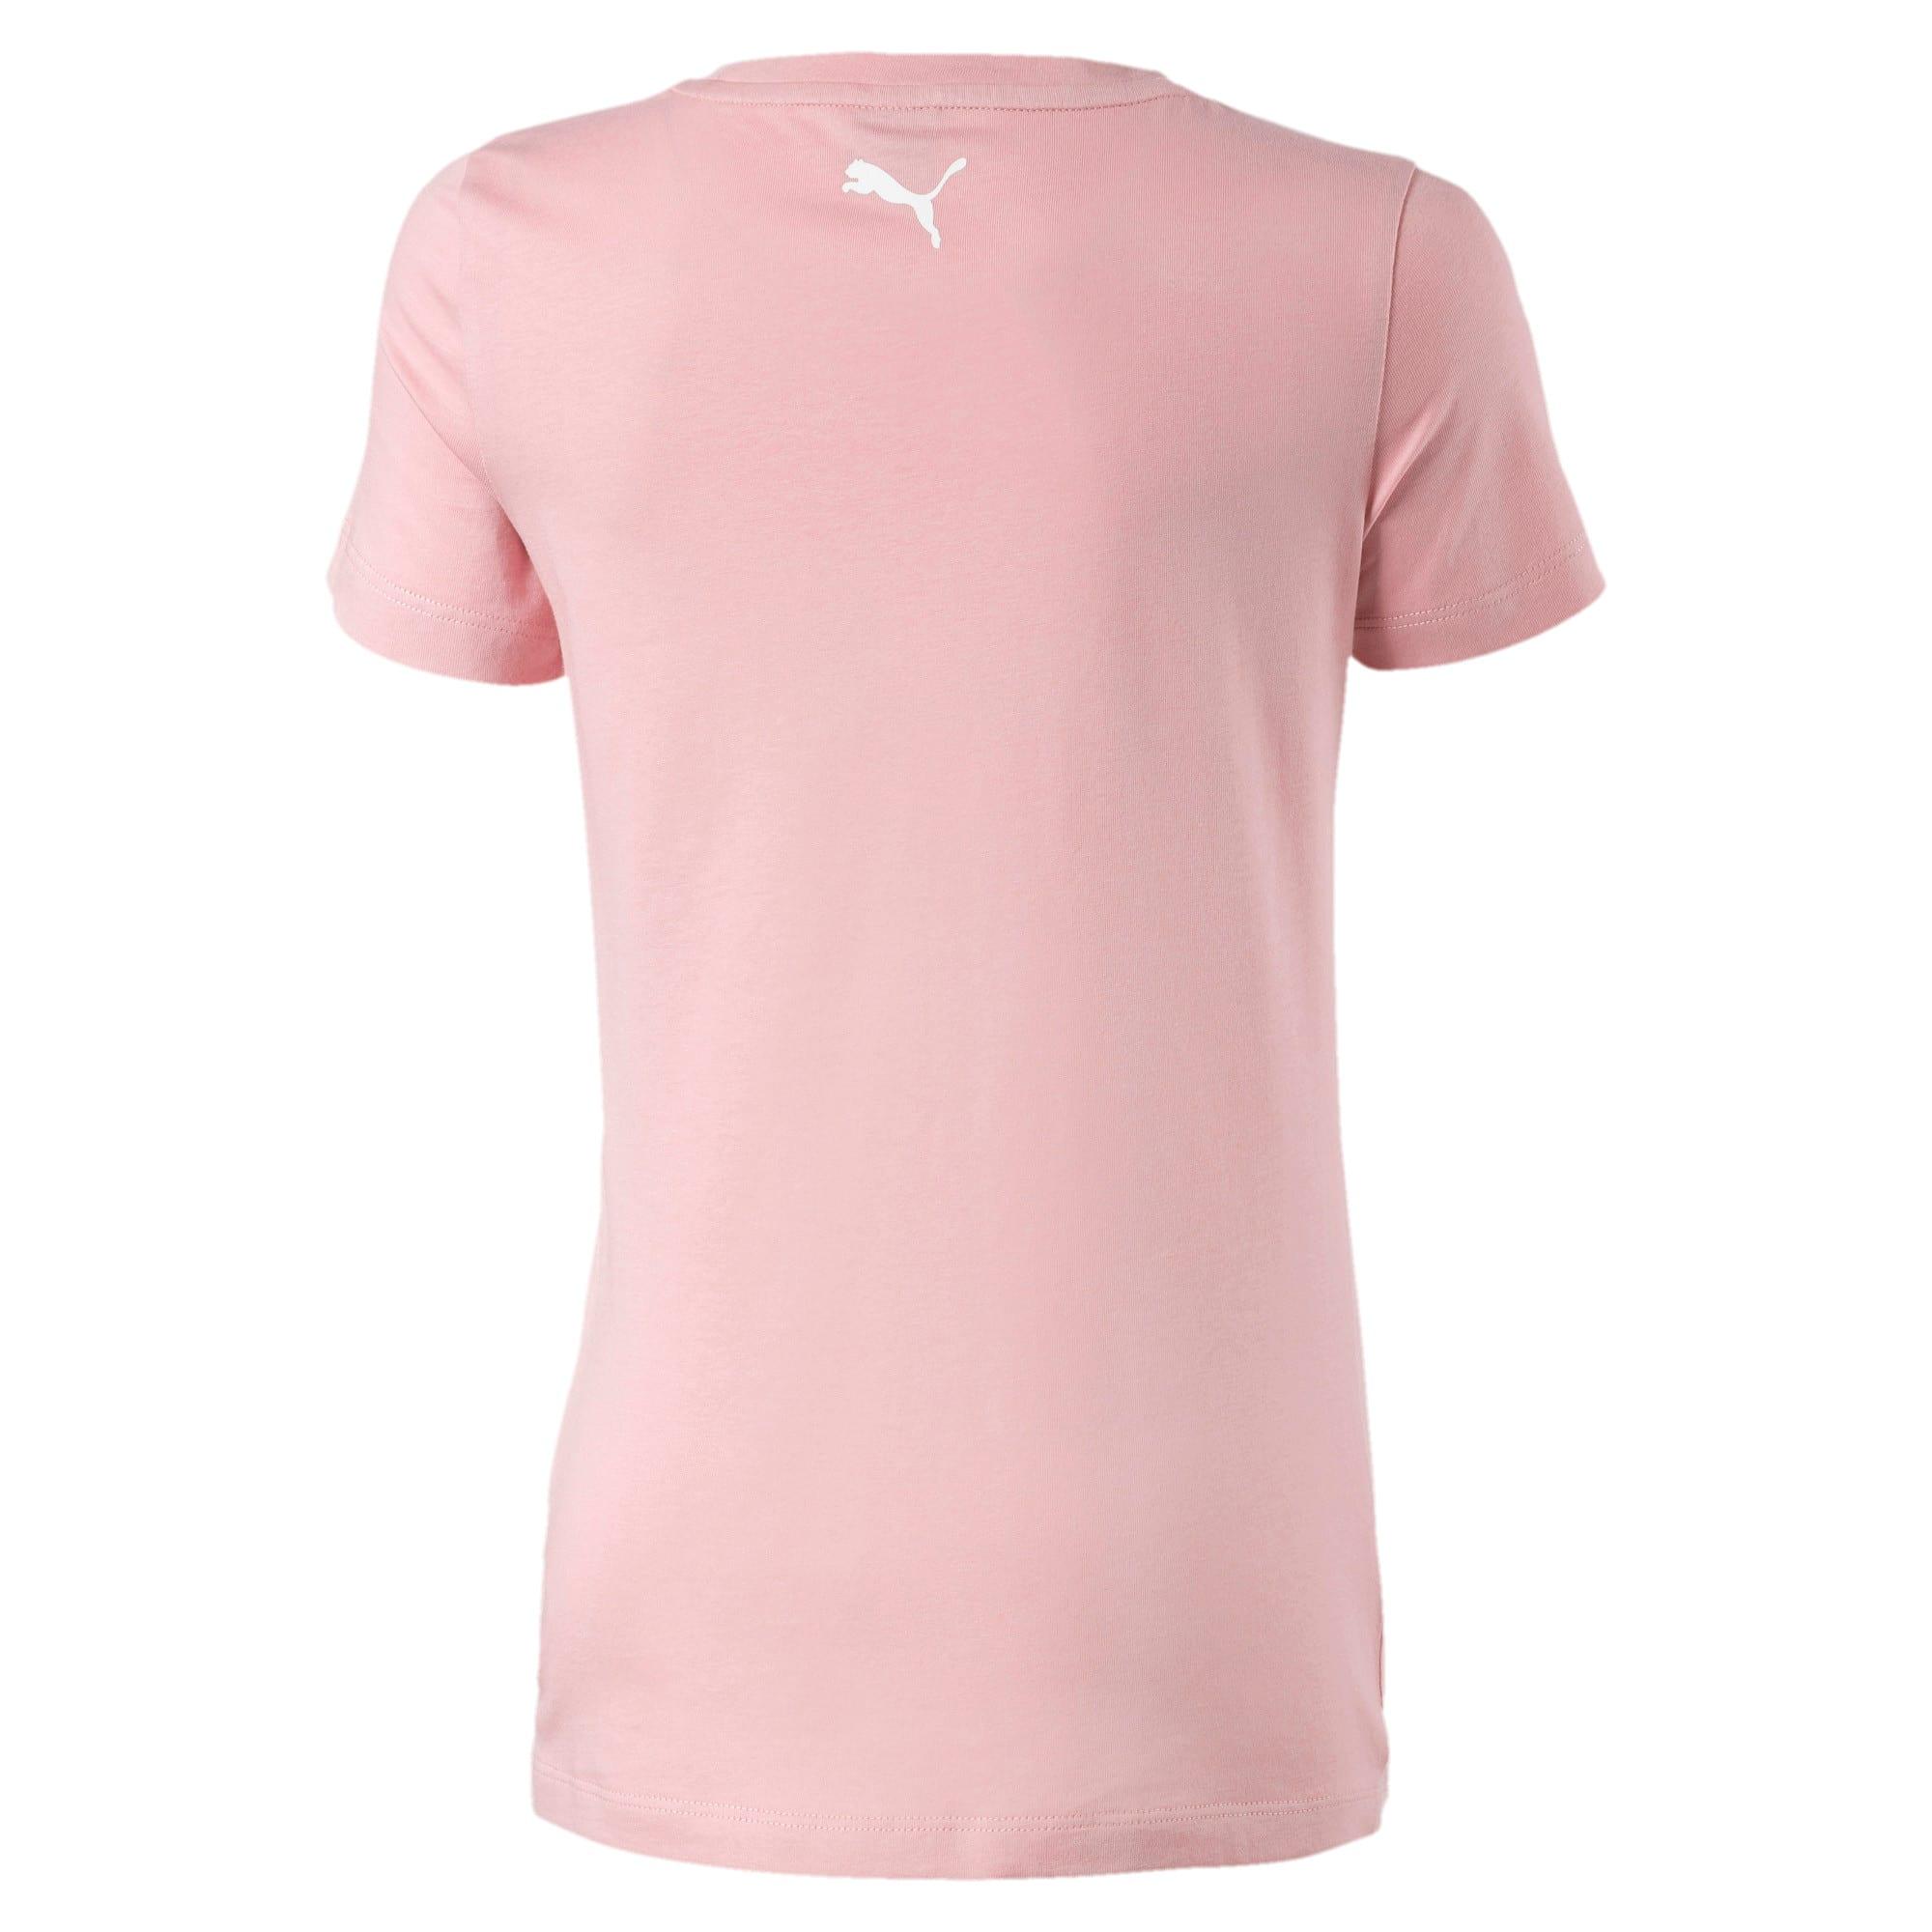 Thumbnail 2 of Alpha T-shirt met korte mouwen en logo voor meisjes, Bridal Rose, medium